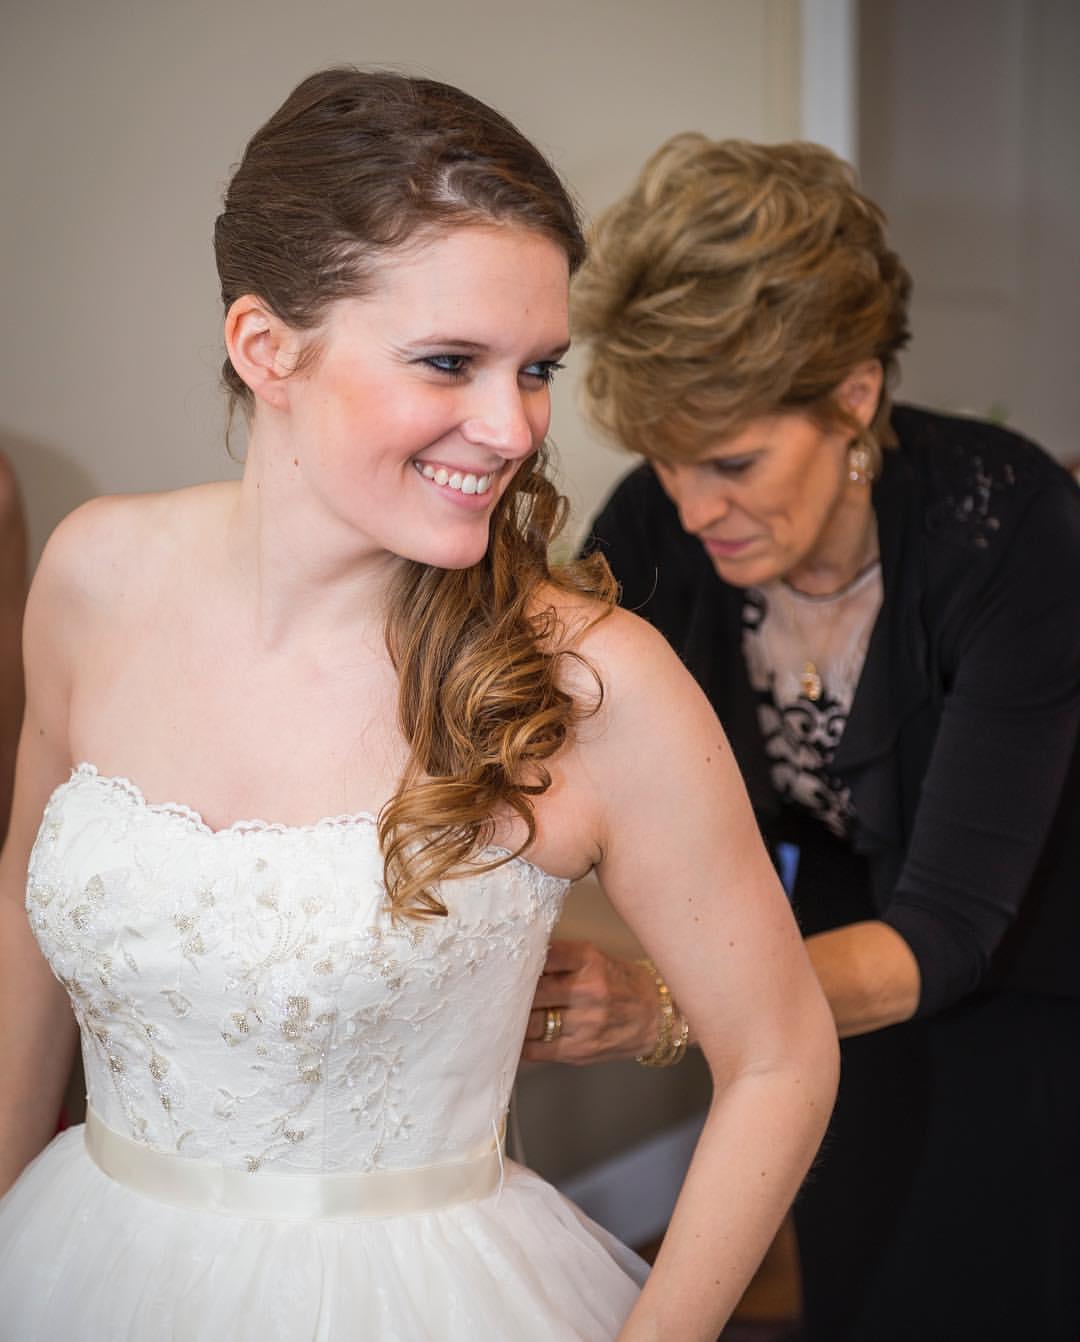 Bridal portrait // The Miner Details weddings